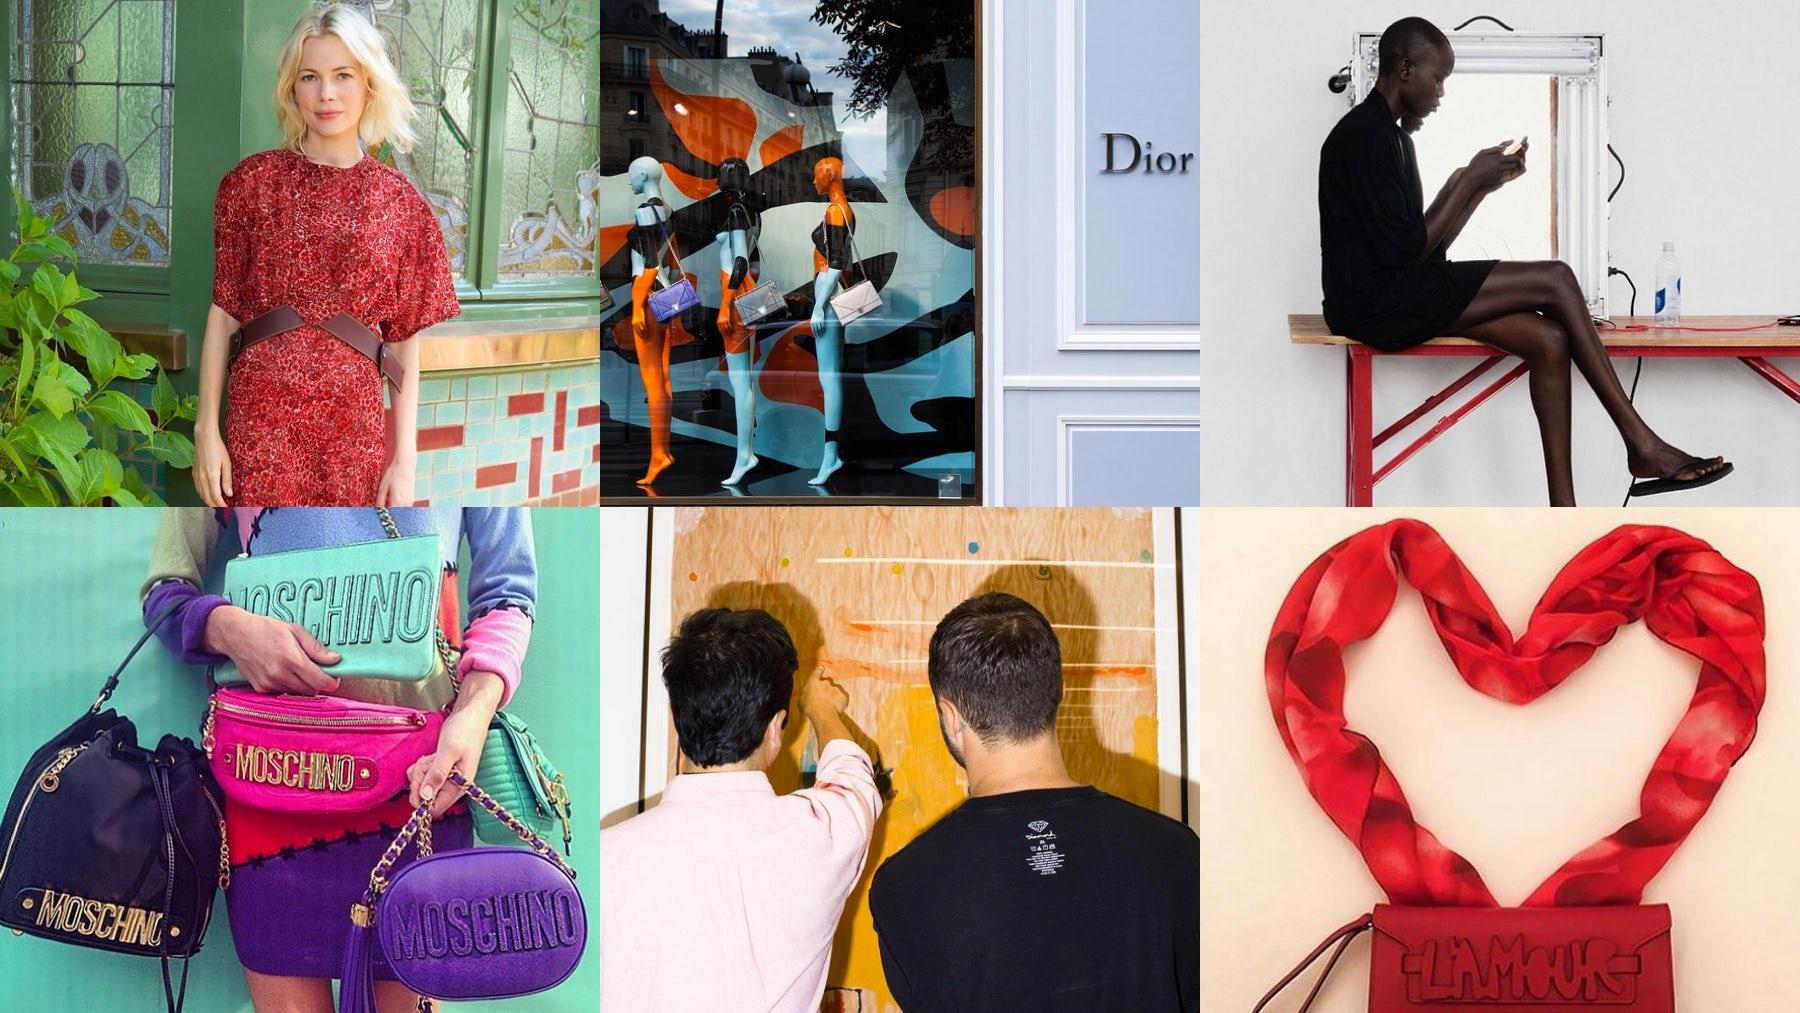 Instagram posts by (clockwise) Louis Vuitton; Dior; Misha Nonoo; Valentino; Proenza Schouler; Moschino | Source: Instagram